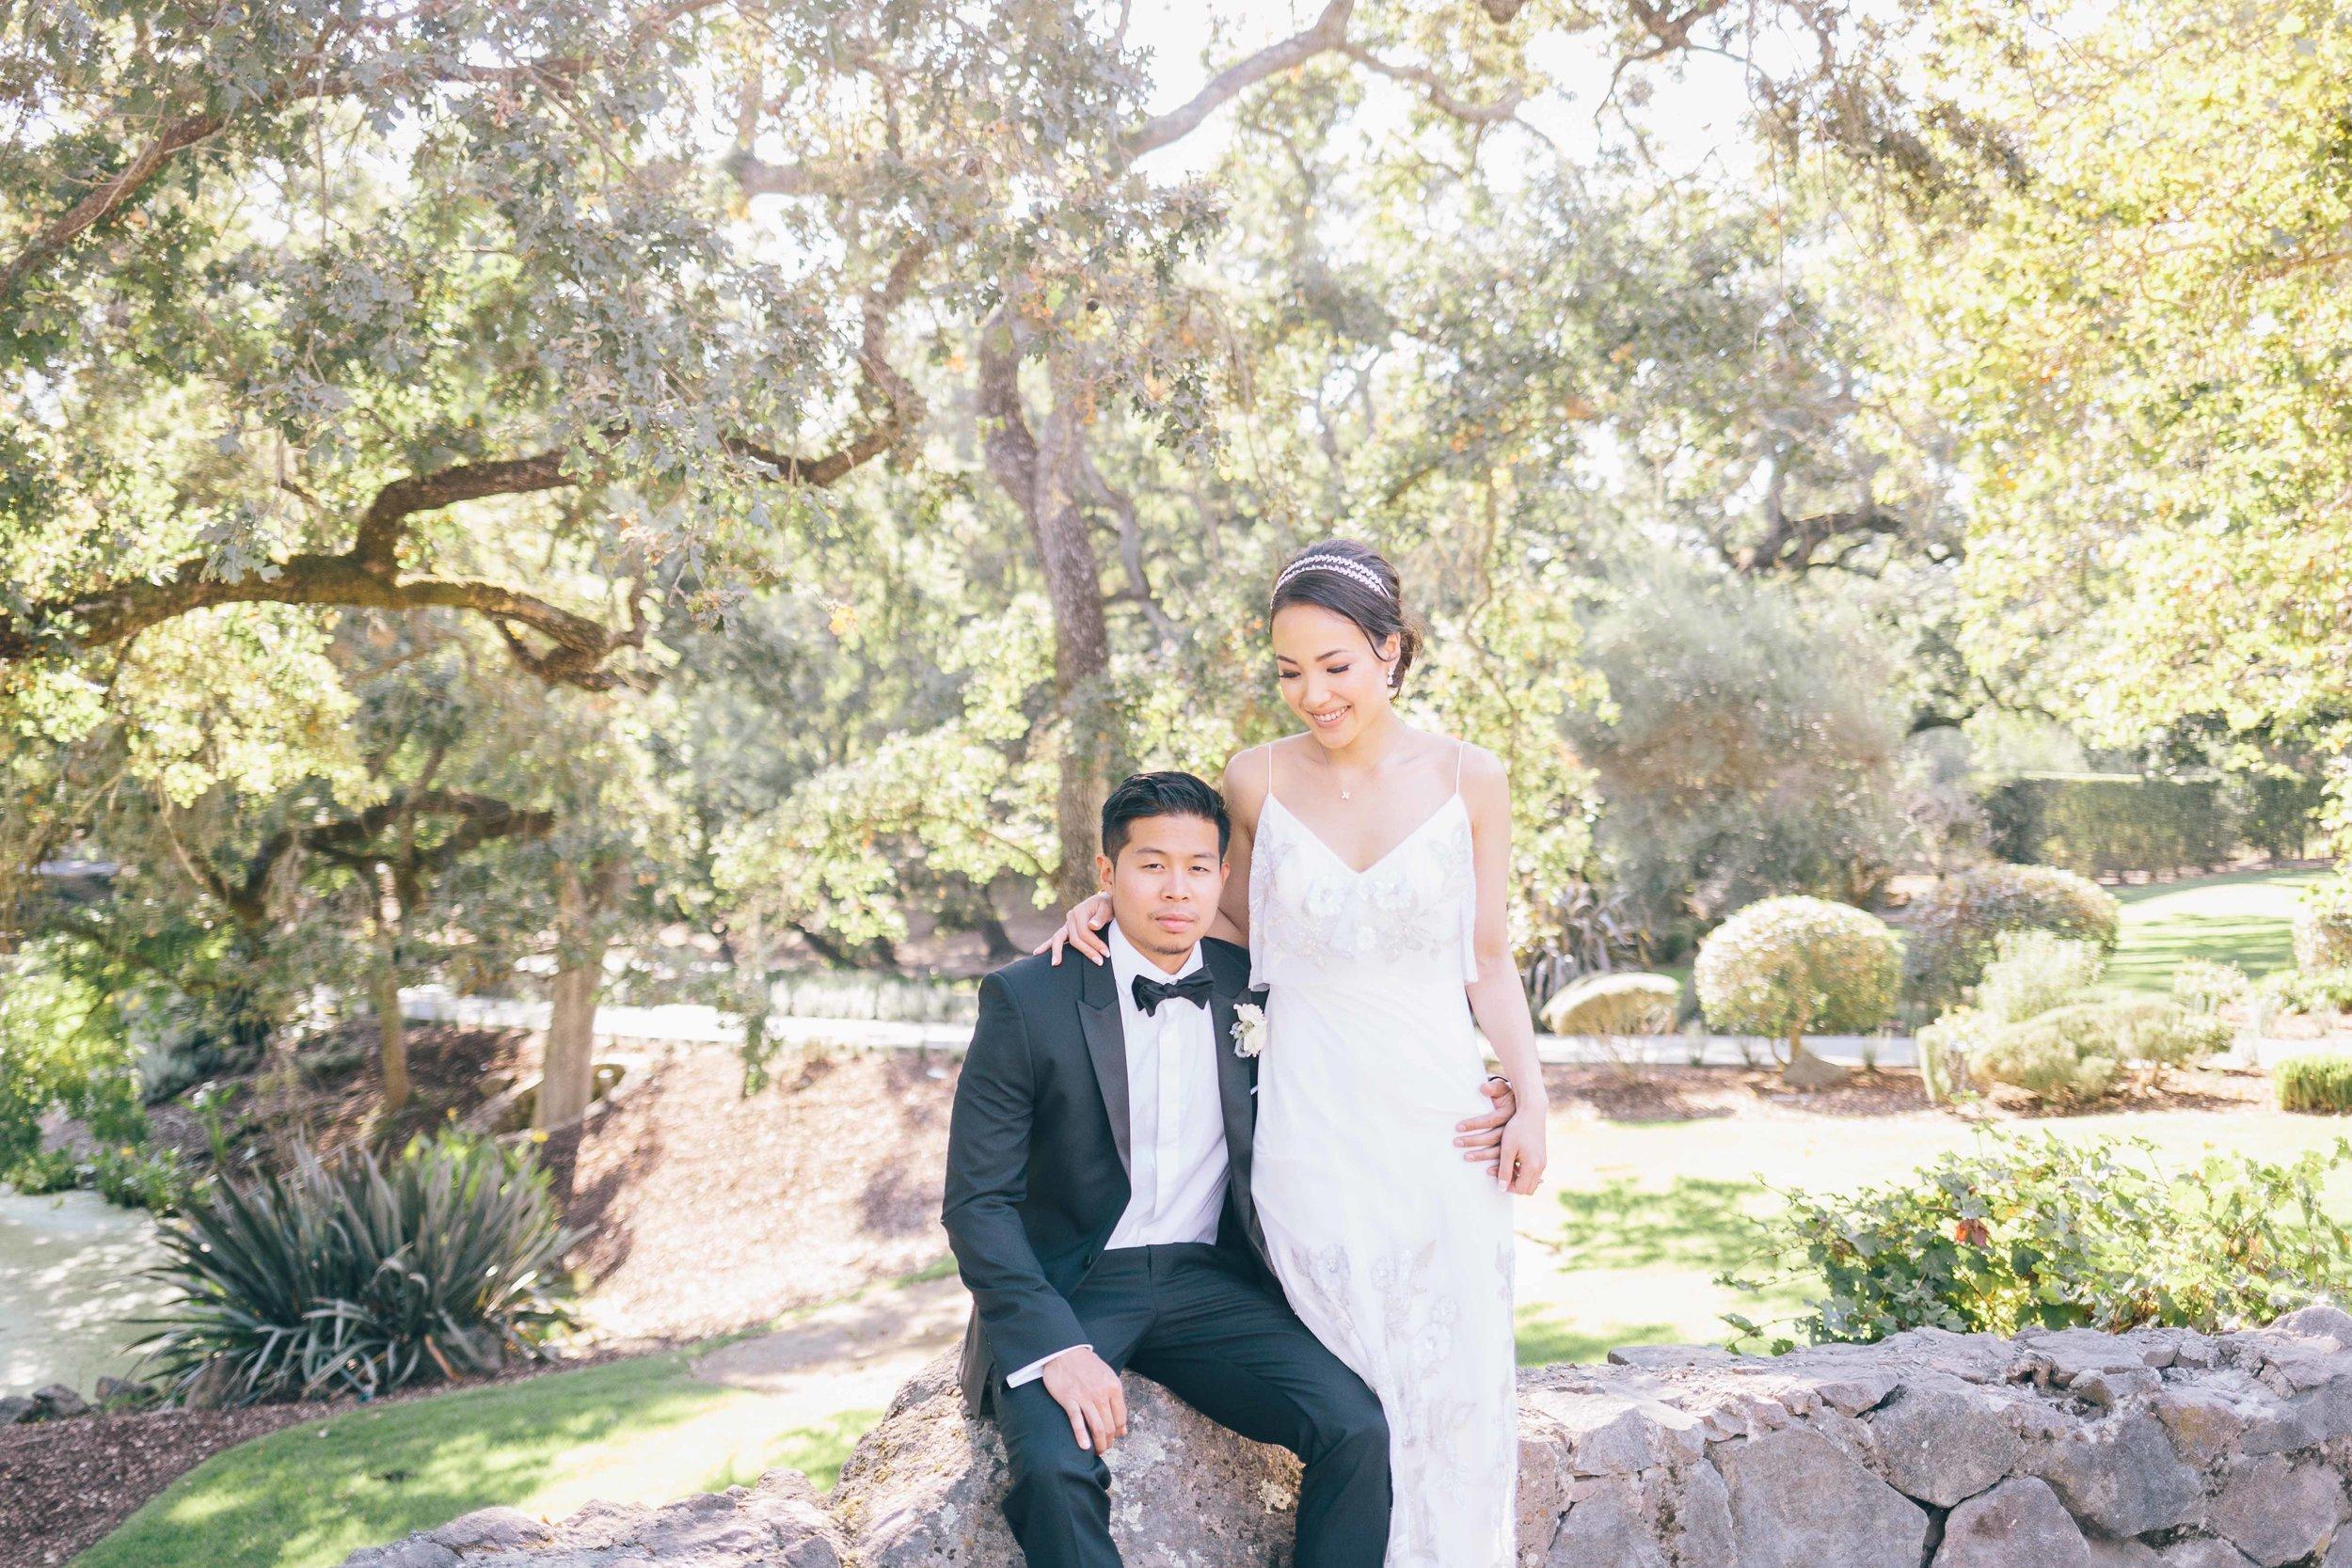 Westin Verasa Wedding at La Toque - JBJ Pictures Wedding Photographer in Napa Sonoma and San Francisco - 1 (14).jpg